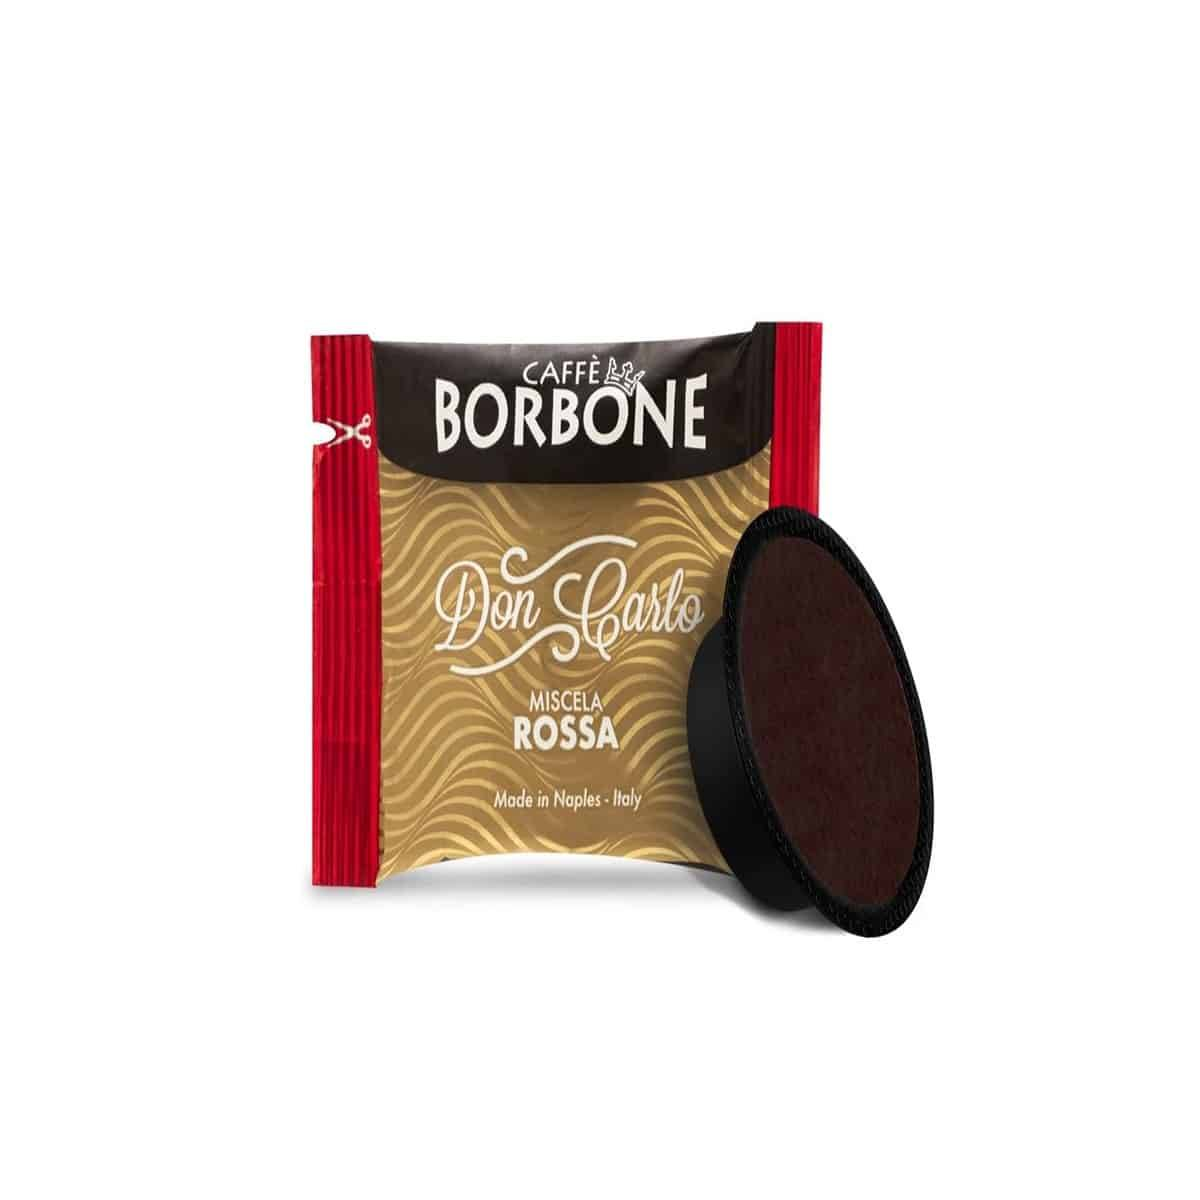 Rocard Caffè Borbone - Linea Don Carlo - Miscela Rossa 400 Capsule